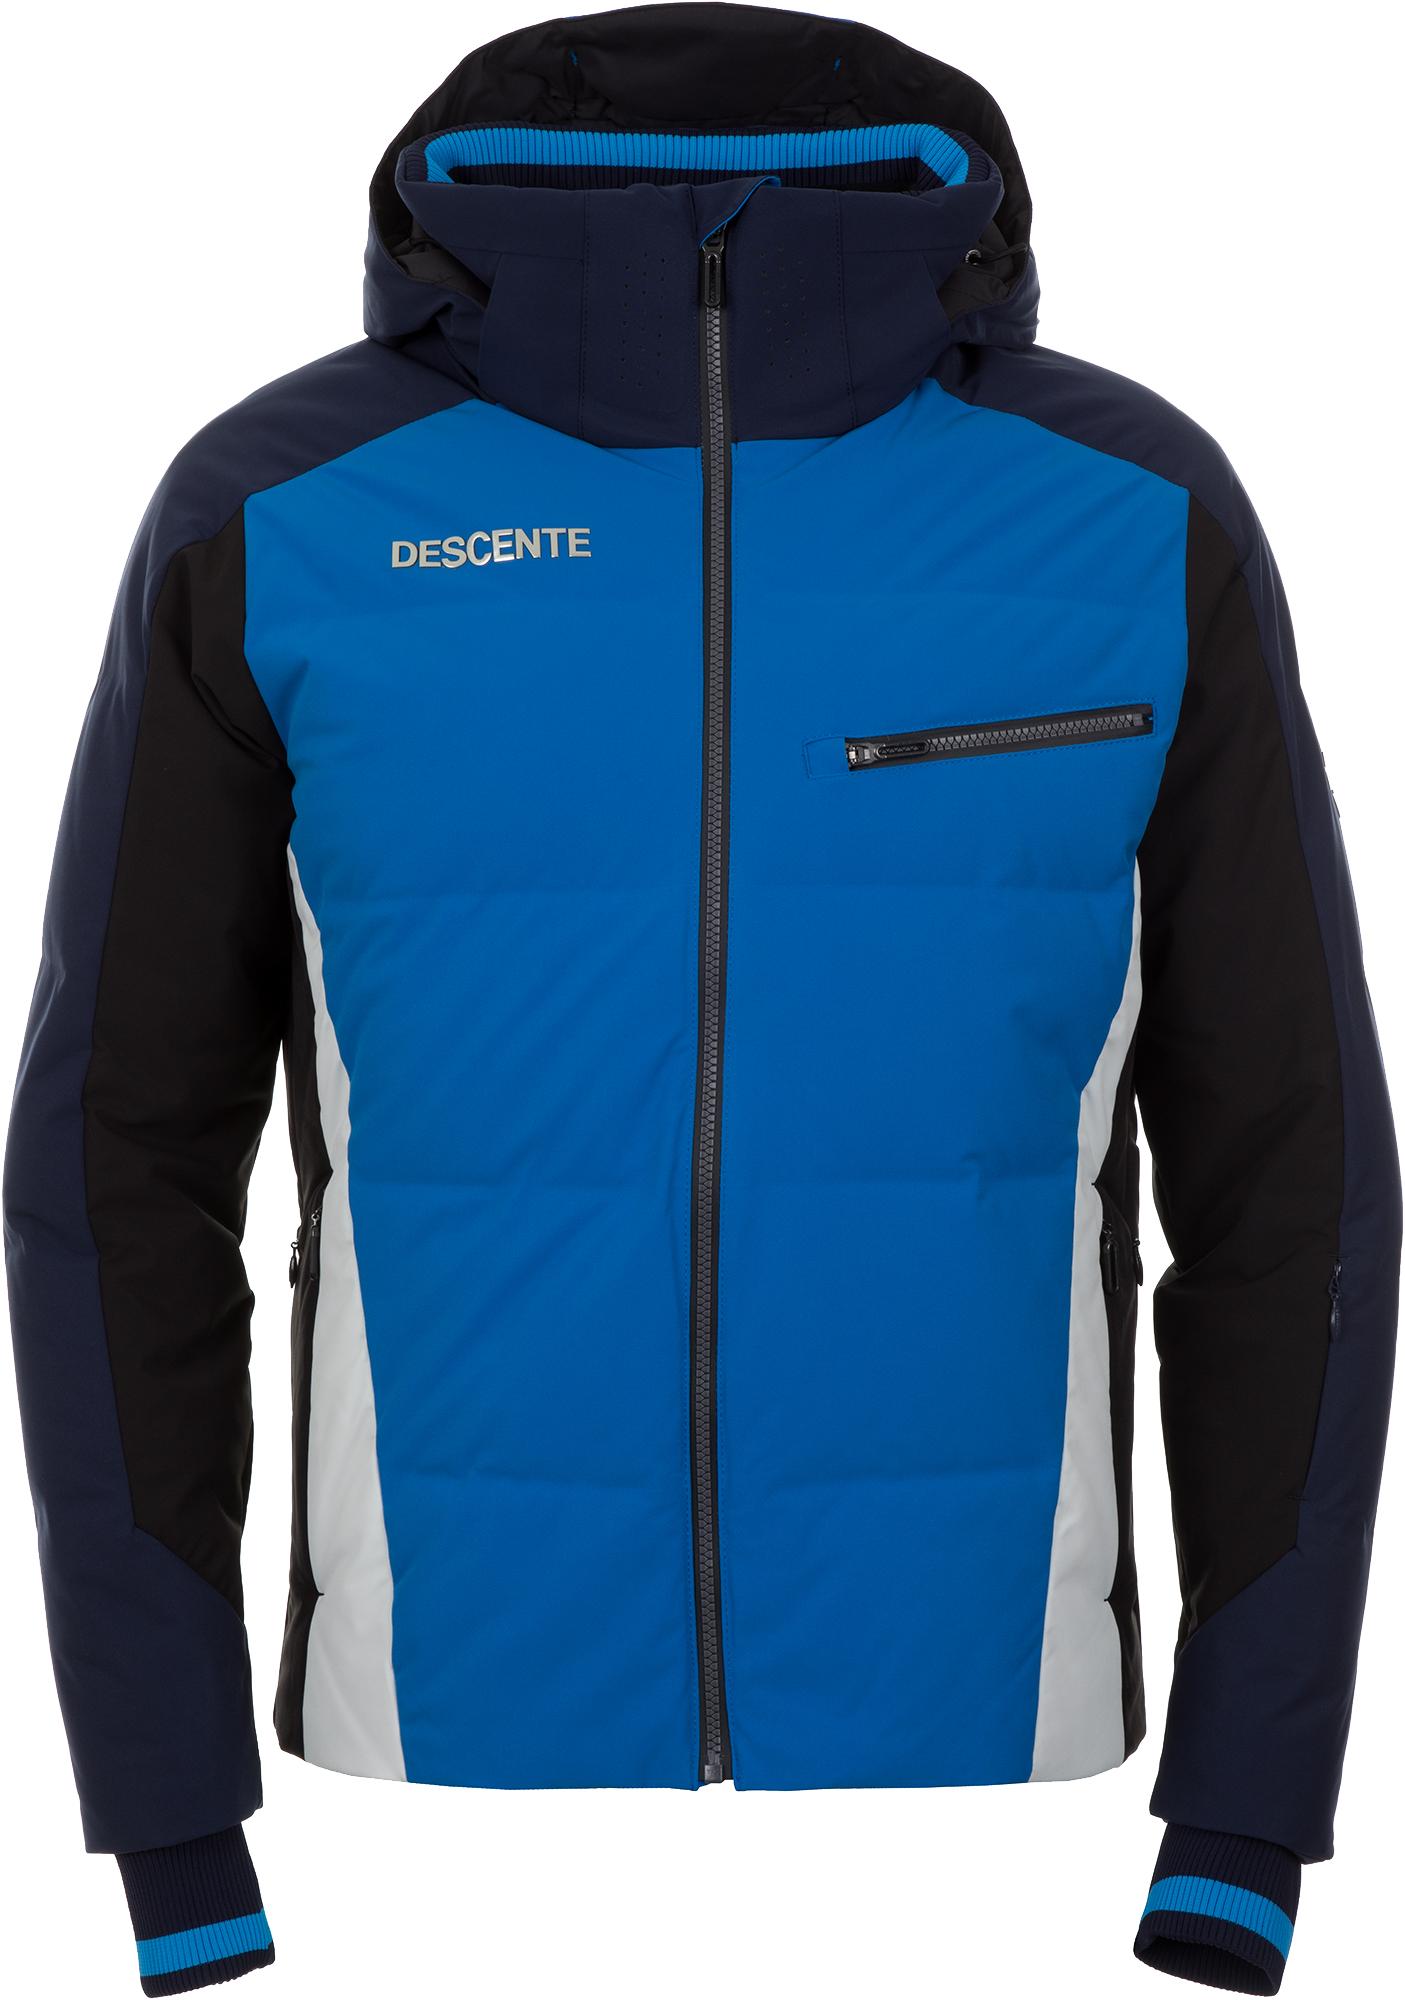 Descente Куртка пуховая мужская Descente Spain, размер 54 куртка мужская geox цвет темно синий m8220kt2447f4386 размер 54